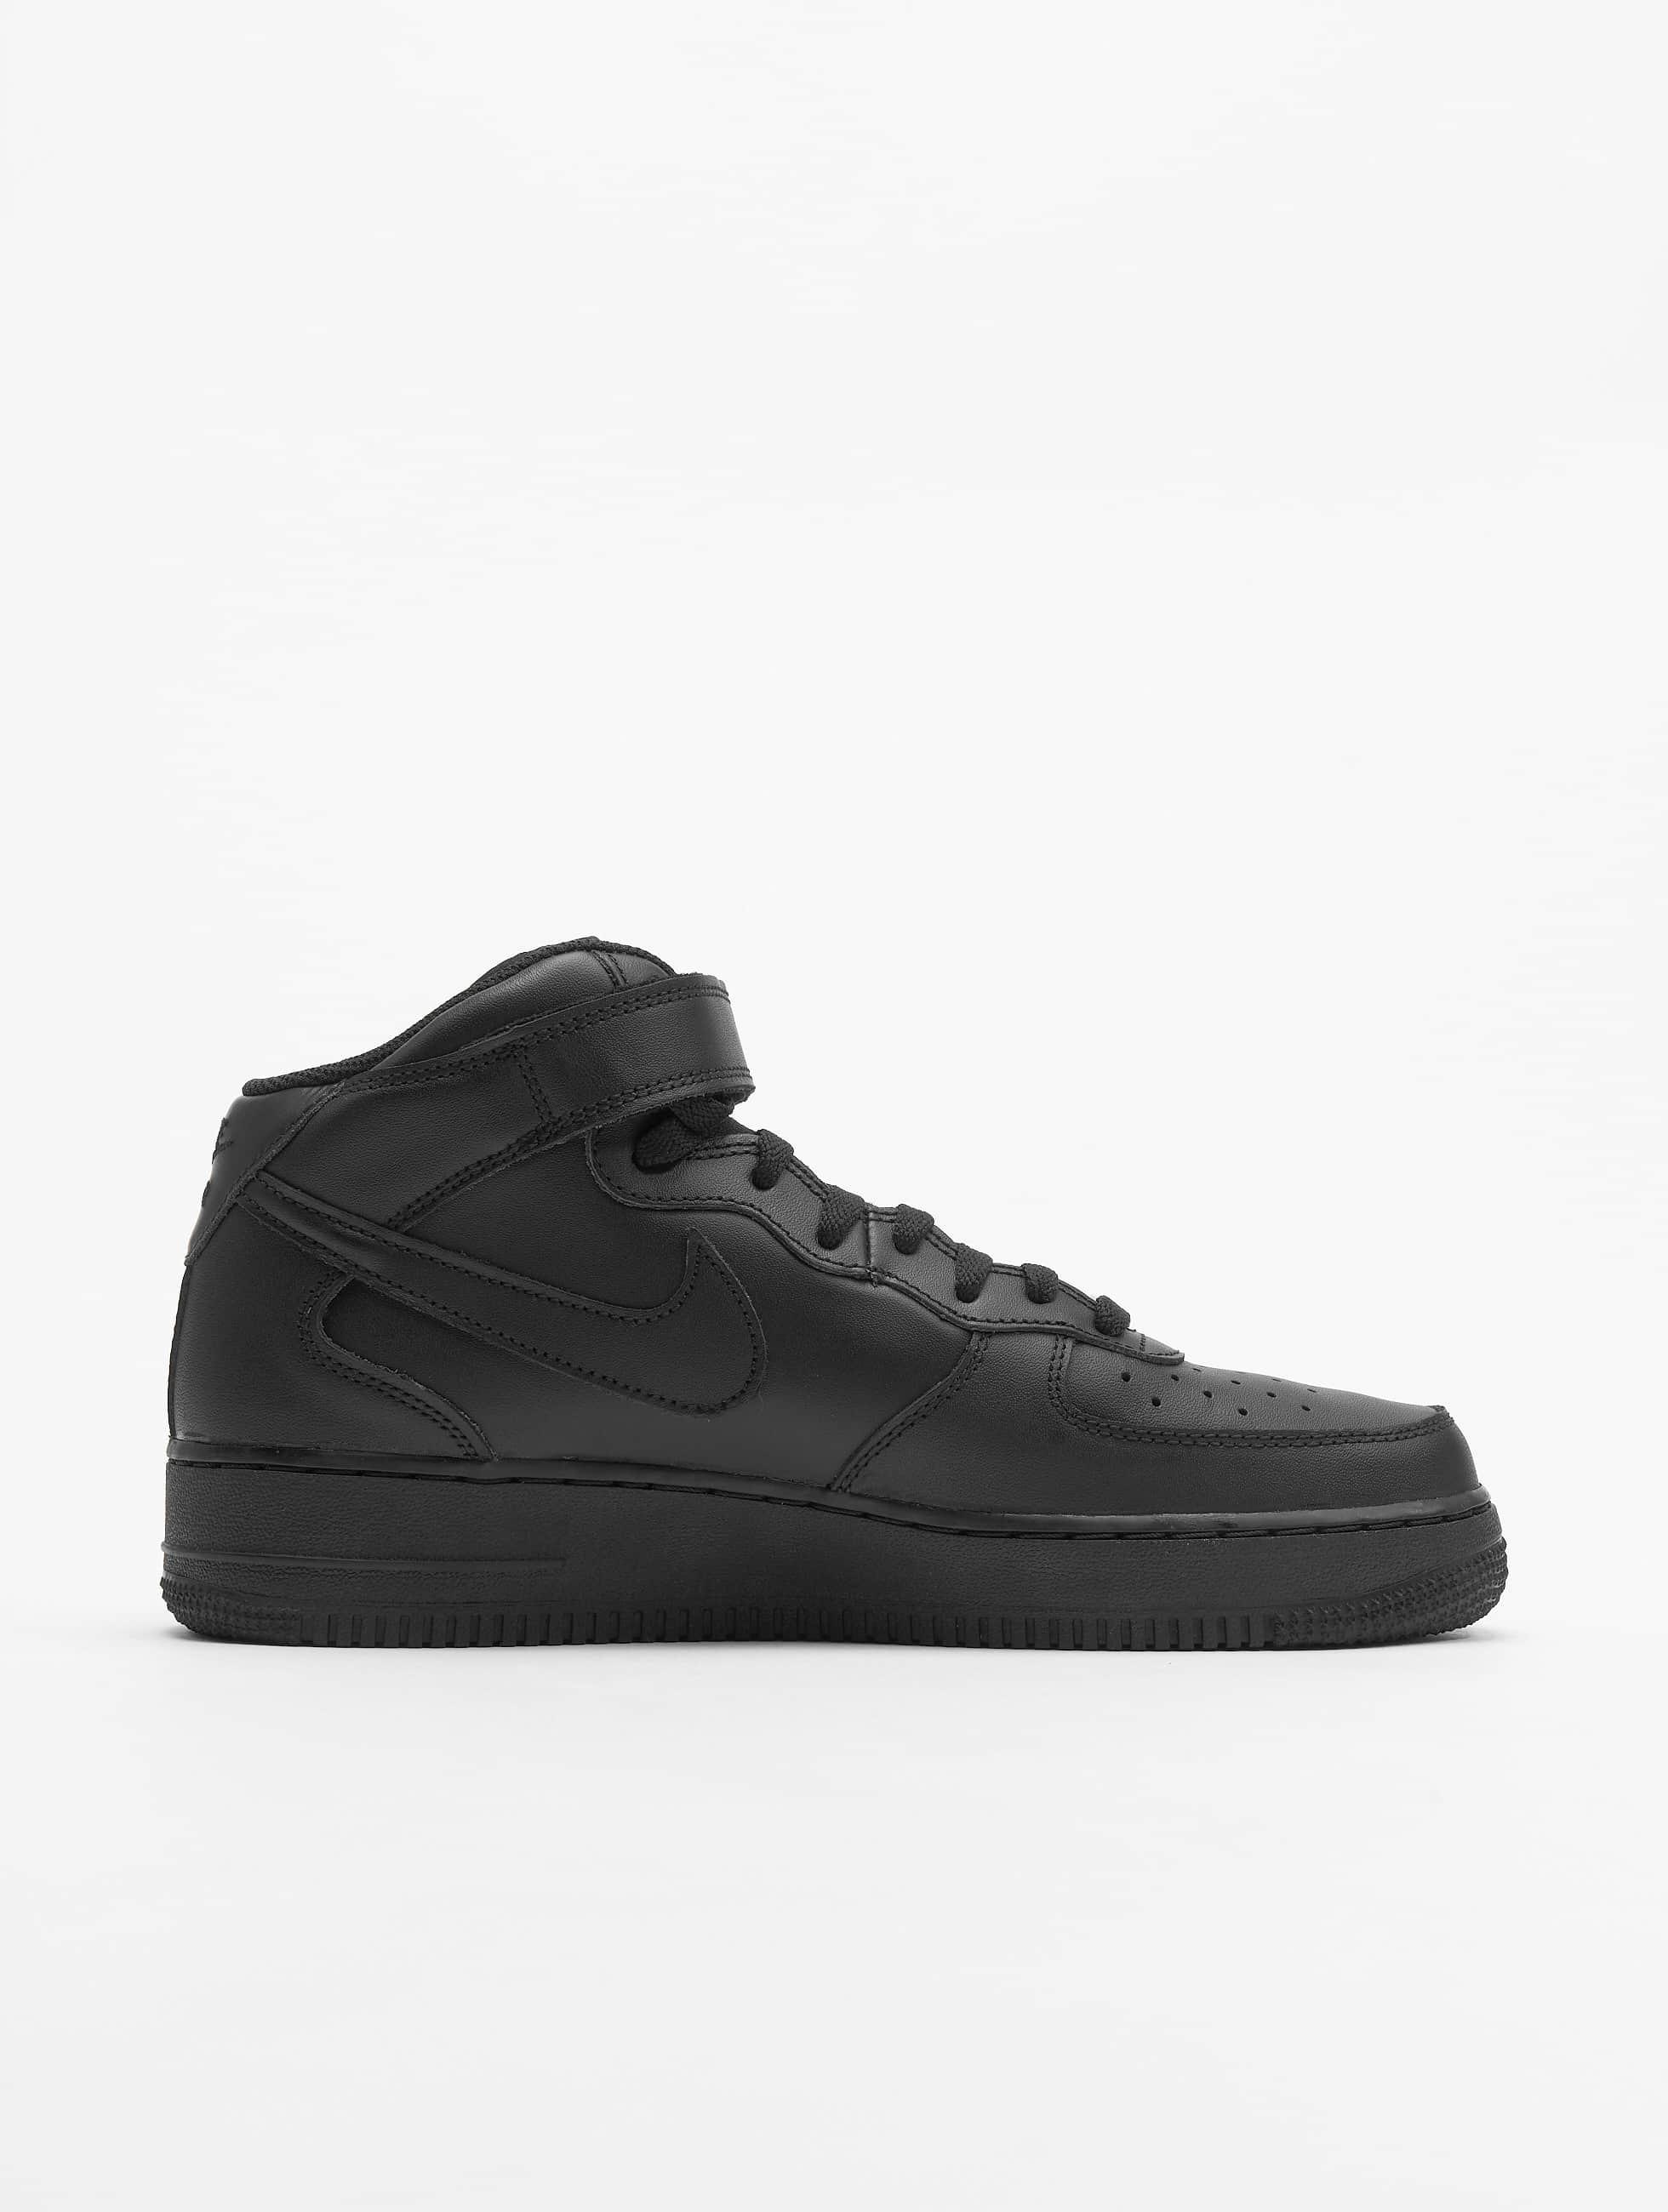 Nike Air Force 1 Hohe Damen Alle Schwarz cLlTz397